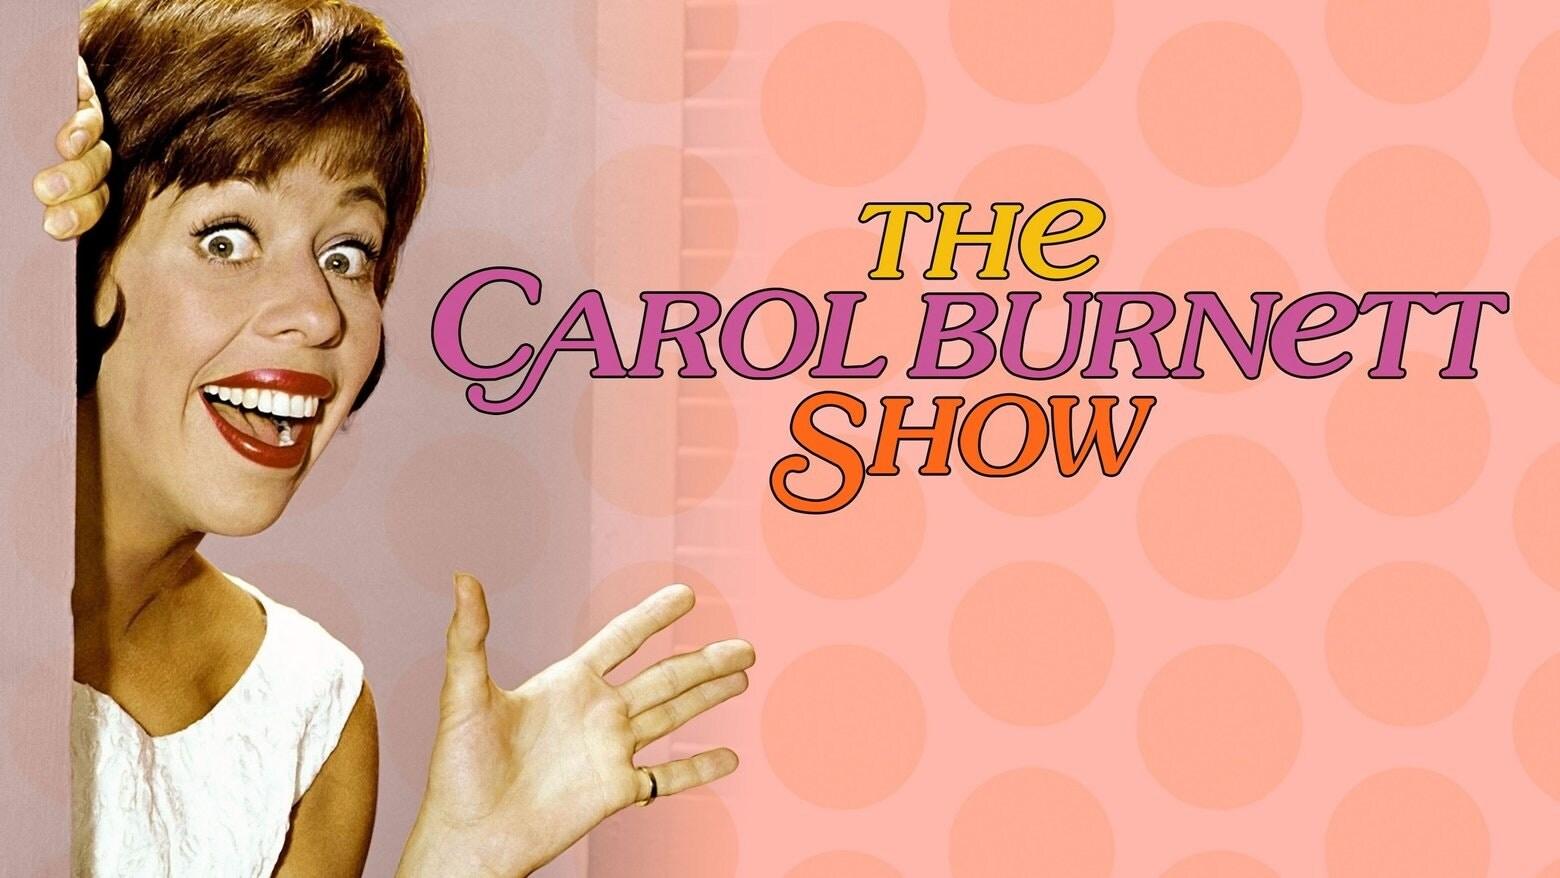 The Carol Burnett Show: Tim Conway